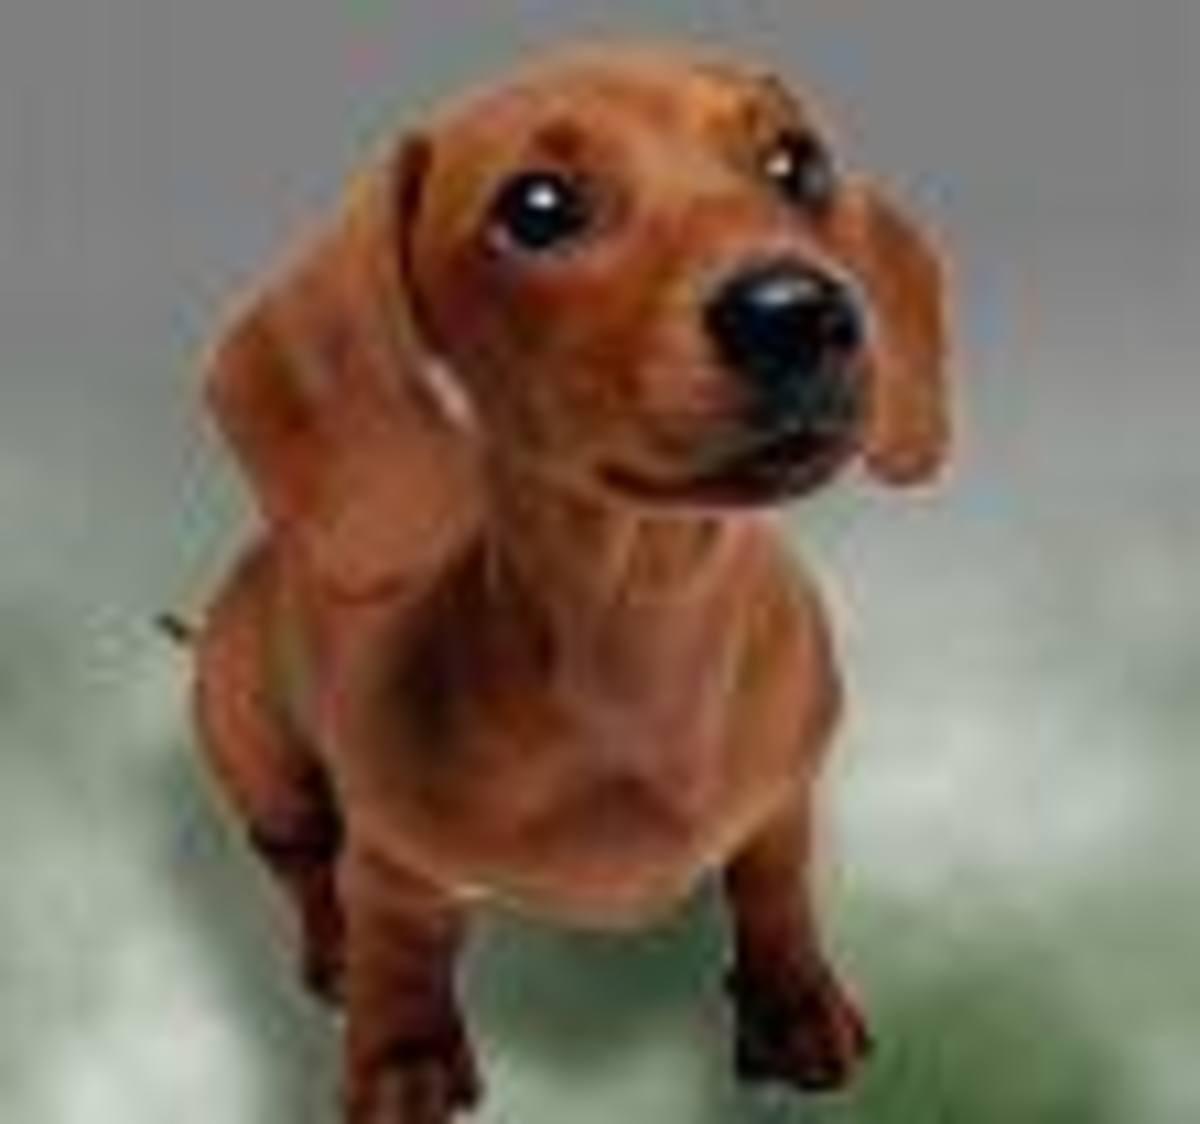 Swedish Bitters helped my dachshund breathe